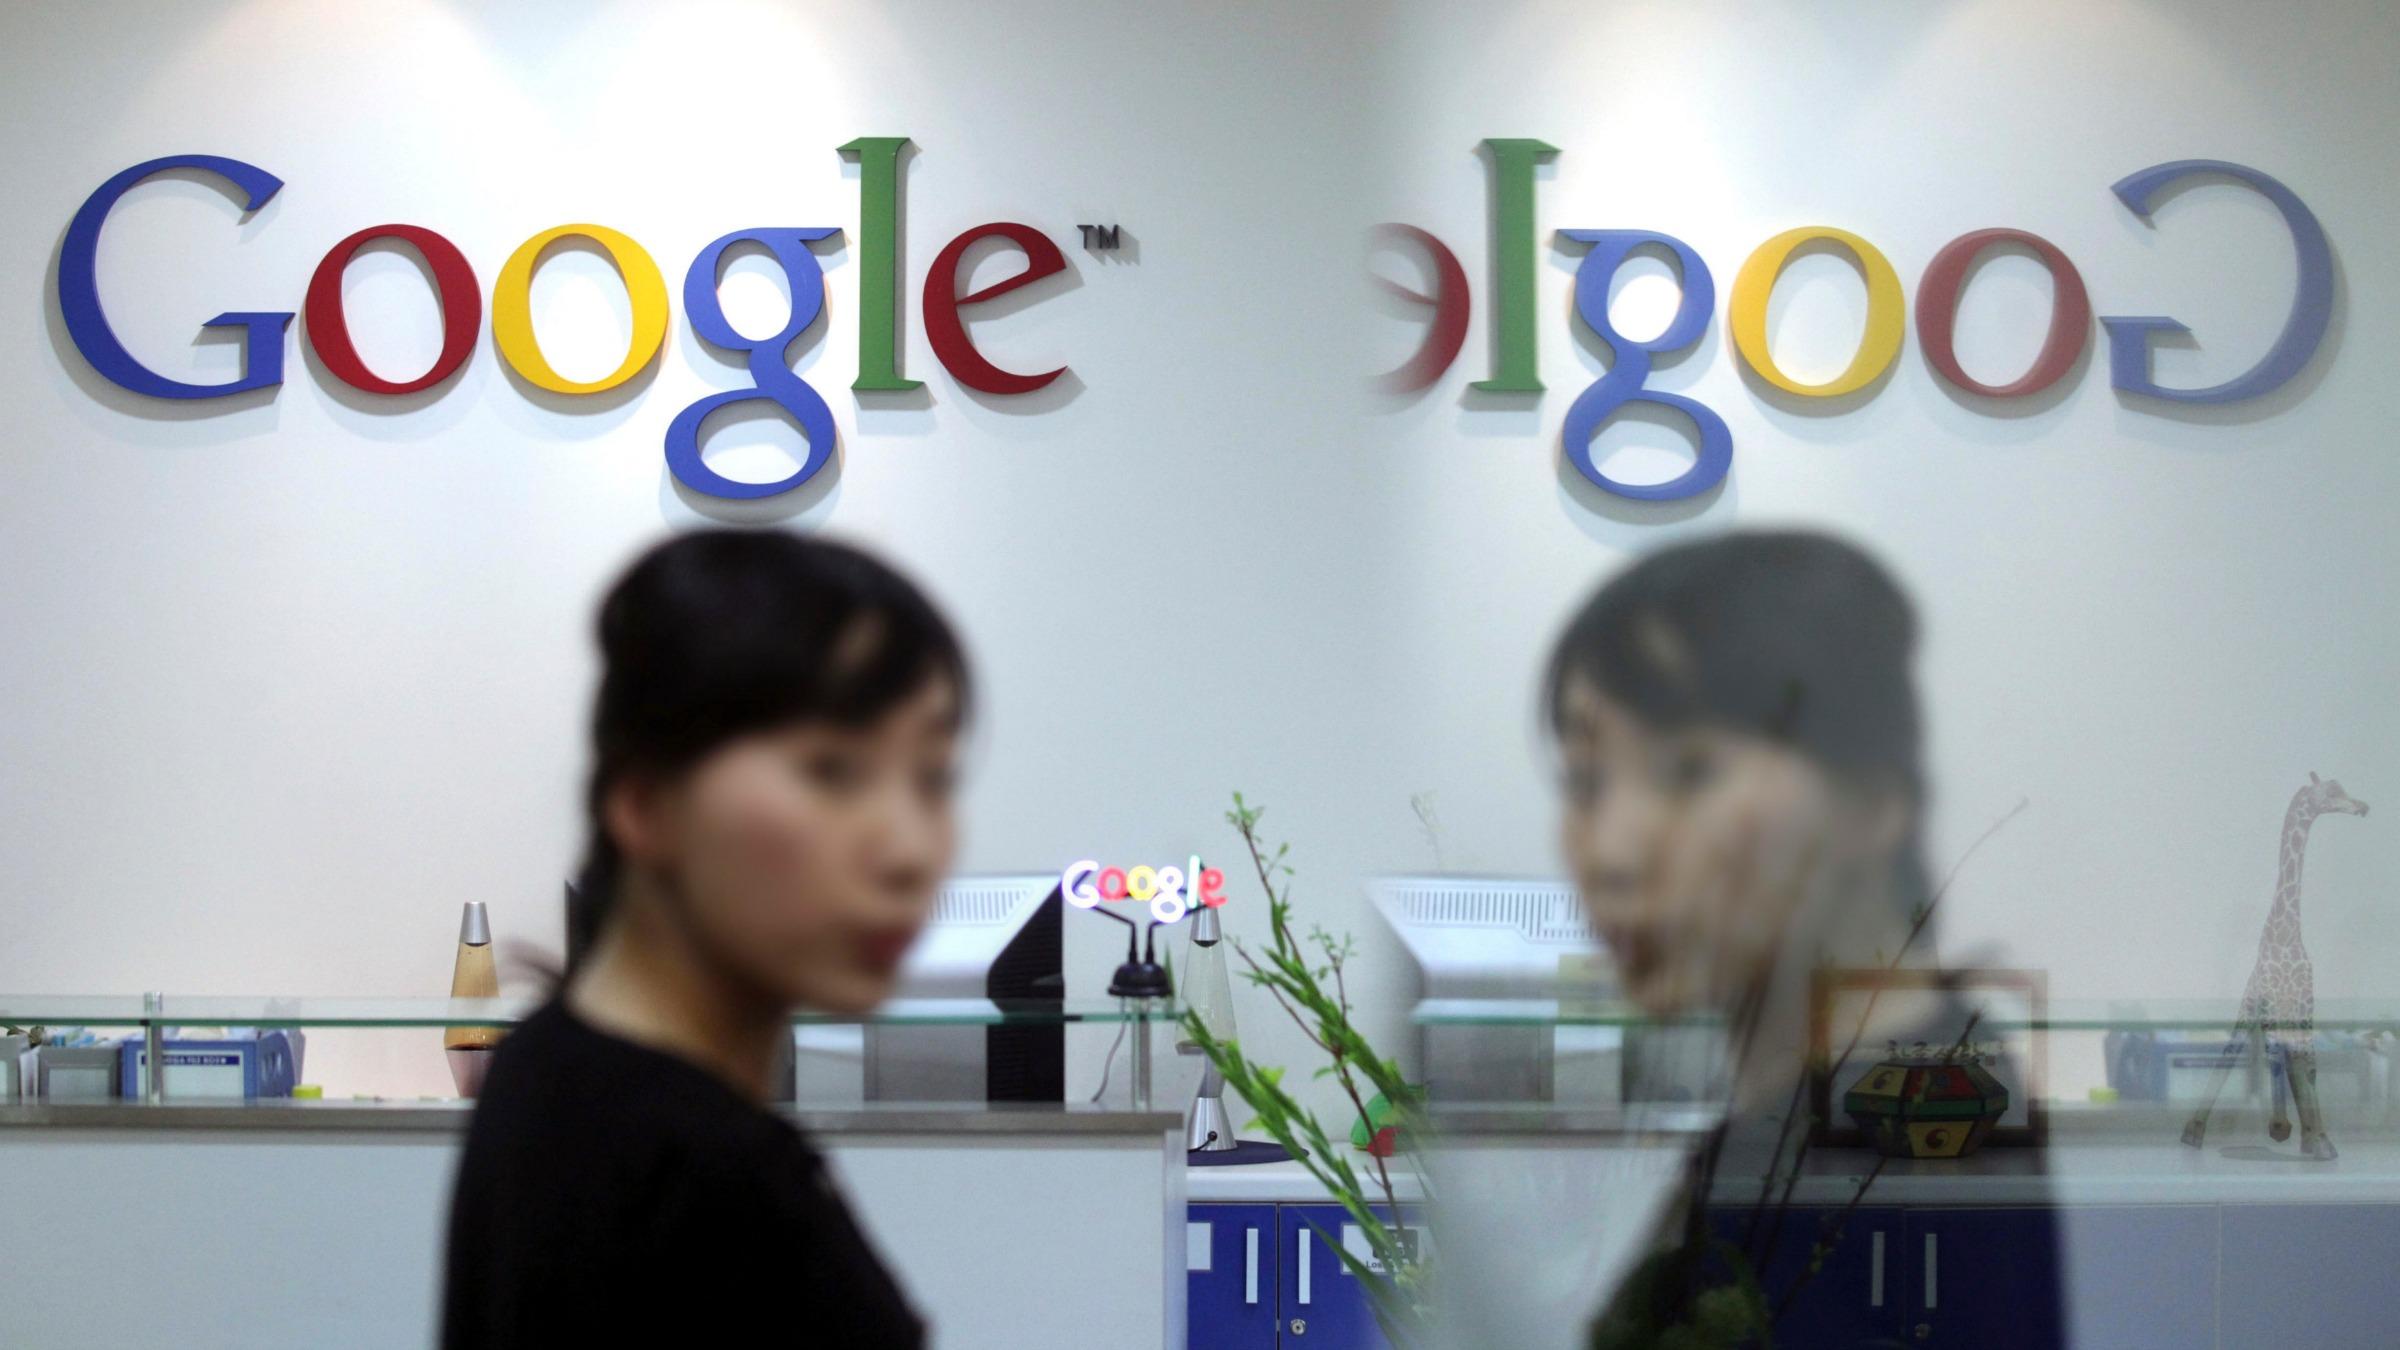 An employee of Google Korea is reflected on the glass door.